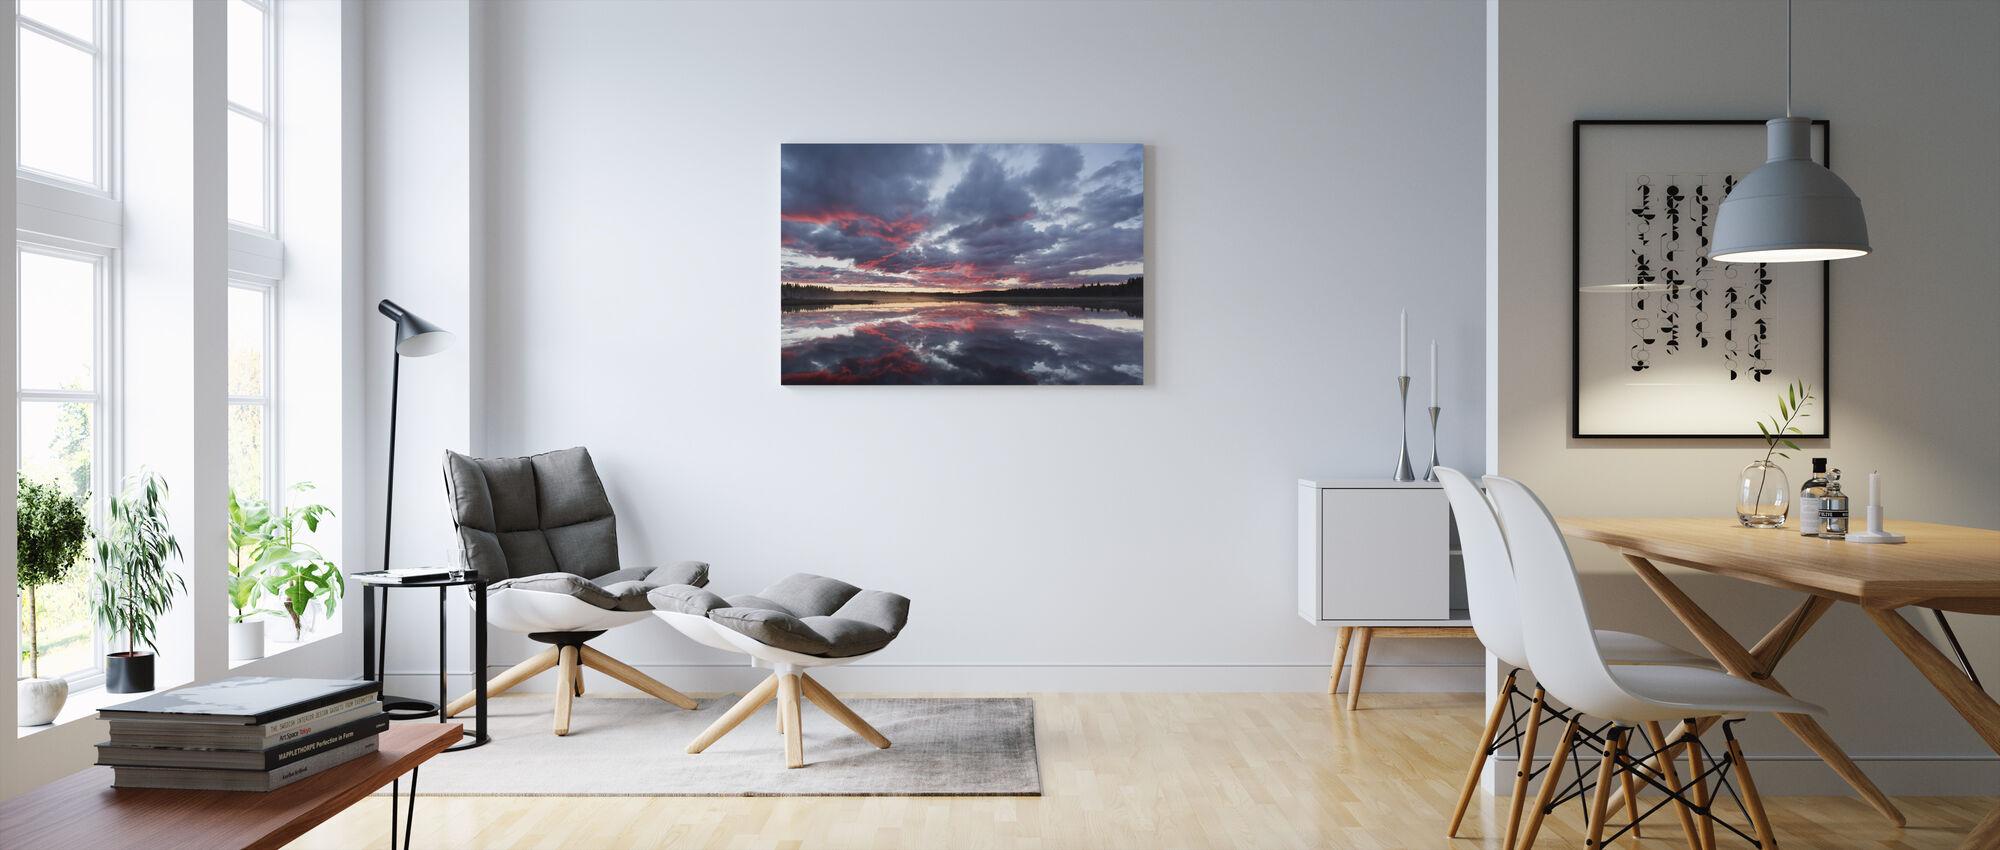 Nydalasjön, Västerbotten - Obraz na płótnie - Pokój dzienny